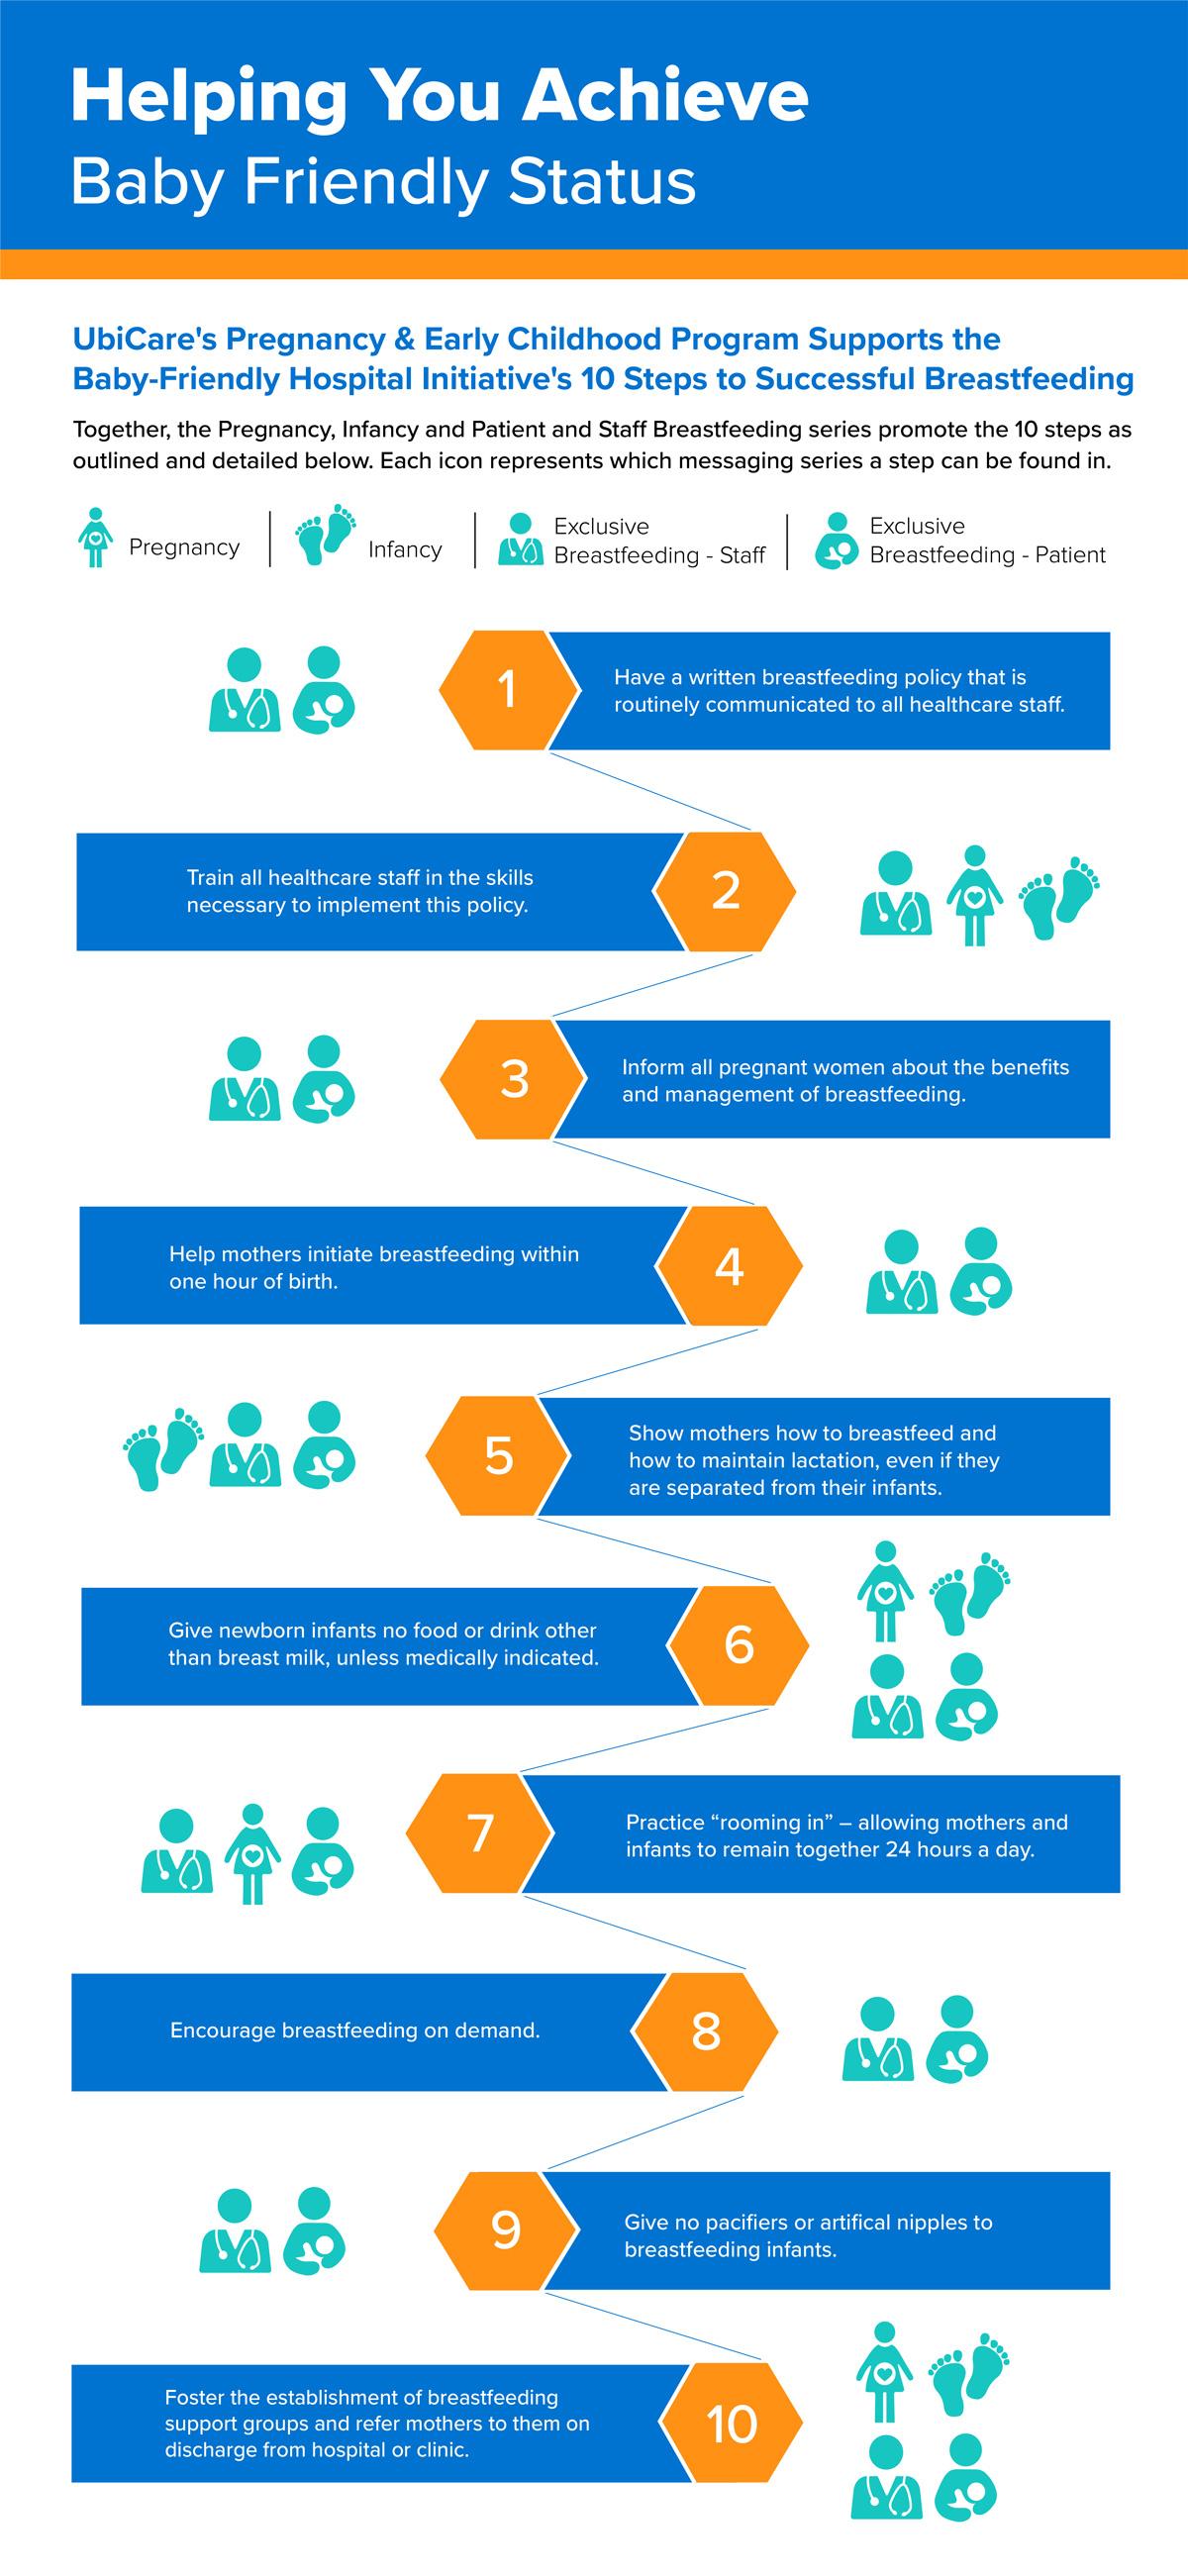 10_Steps_Successful_Breastfeeding-Aug2019.jpg